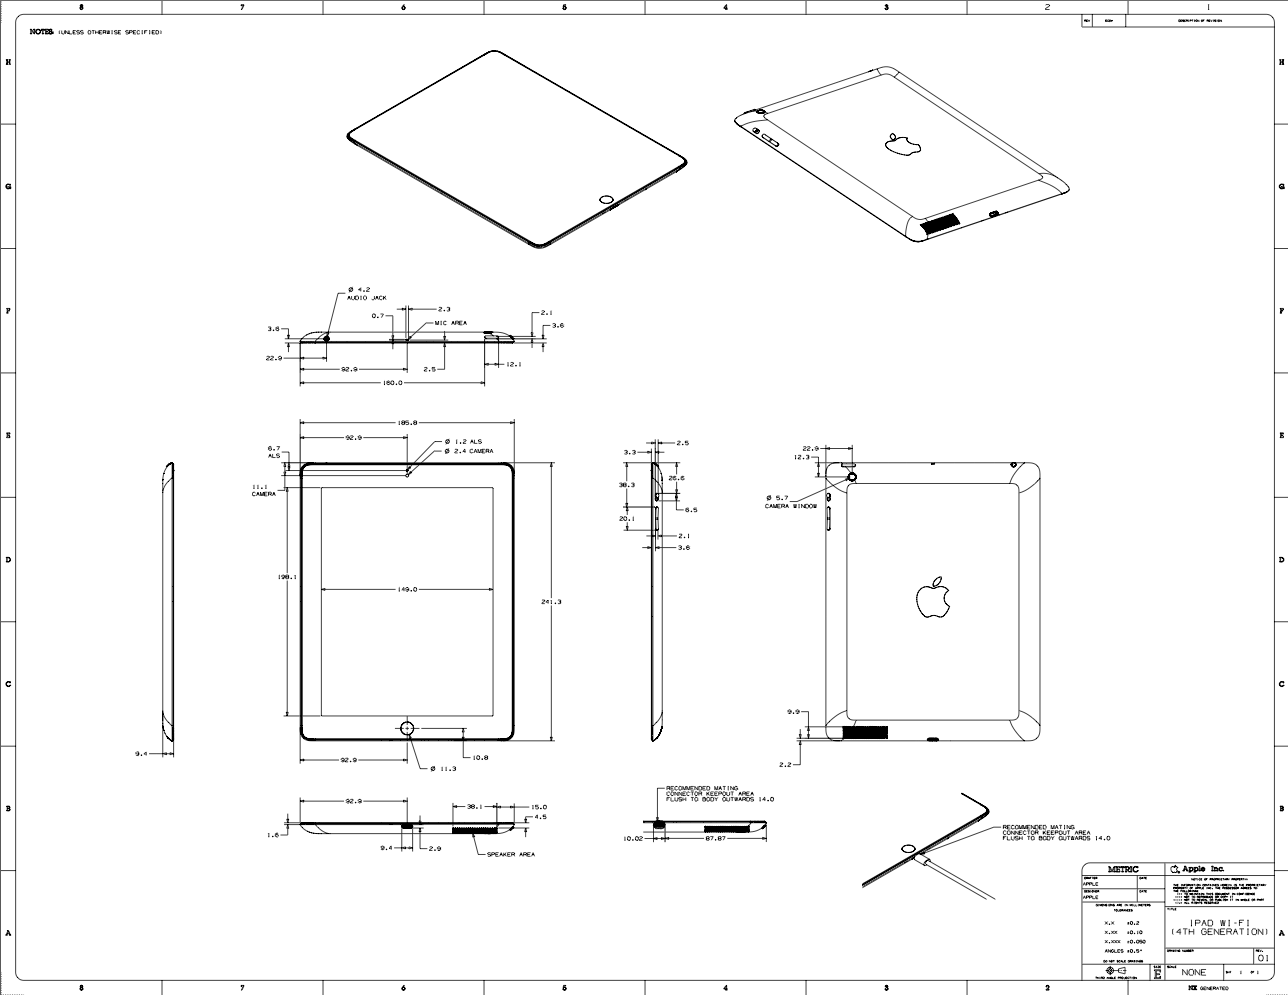 Full ipad mini and fourth generation ipad schematics blueprints now guides malvernweather Choice Image